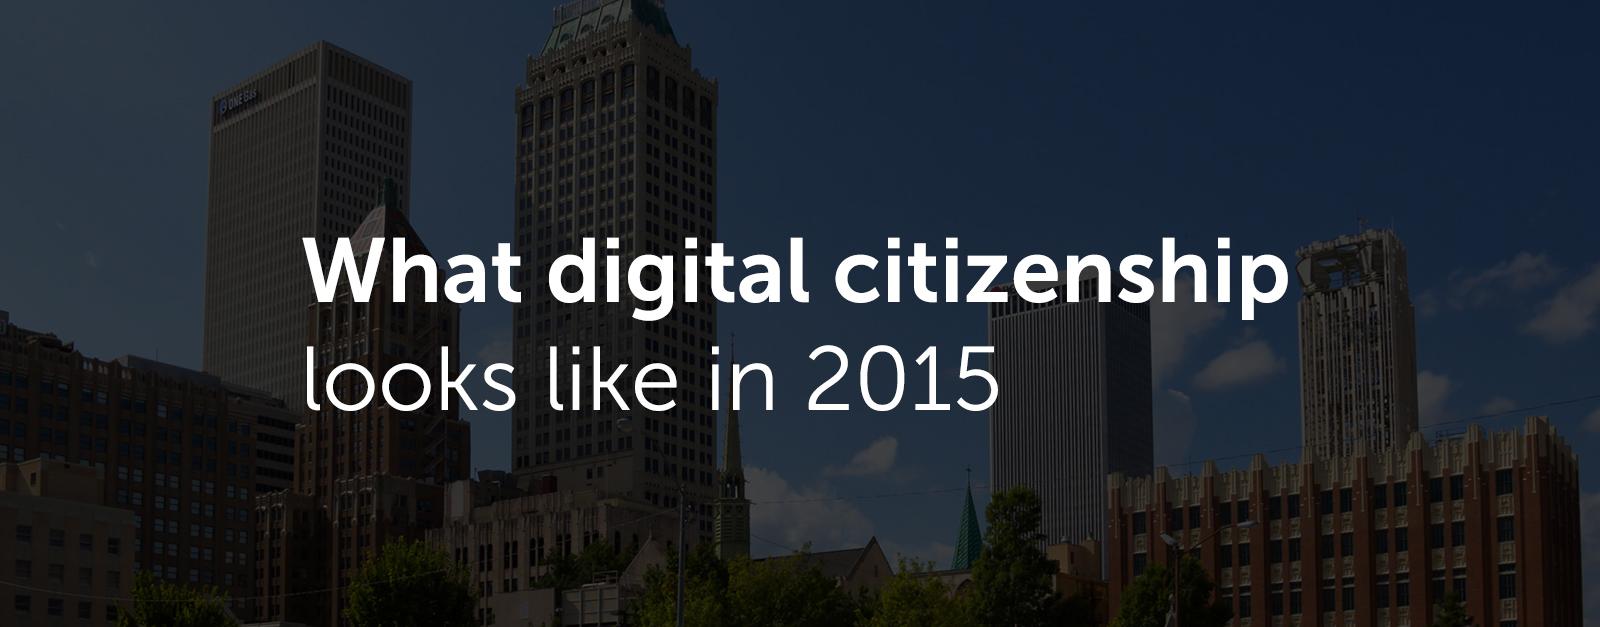 digital-citizenship-2015.jpg